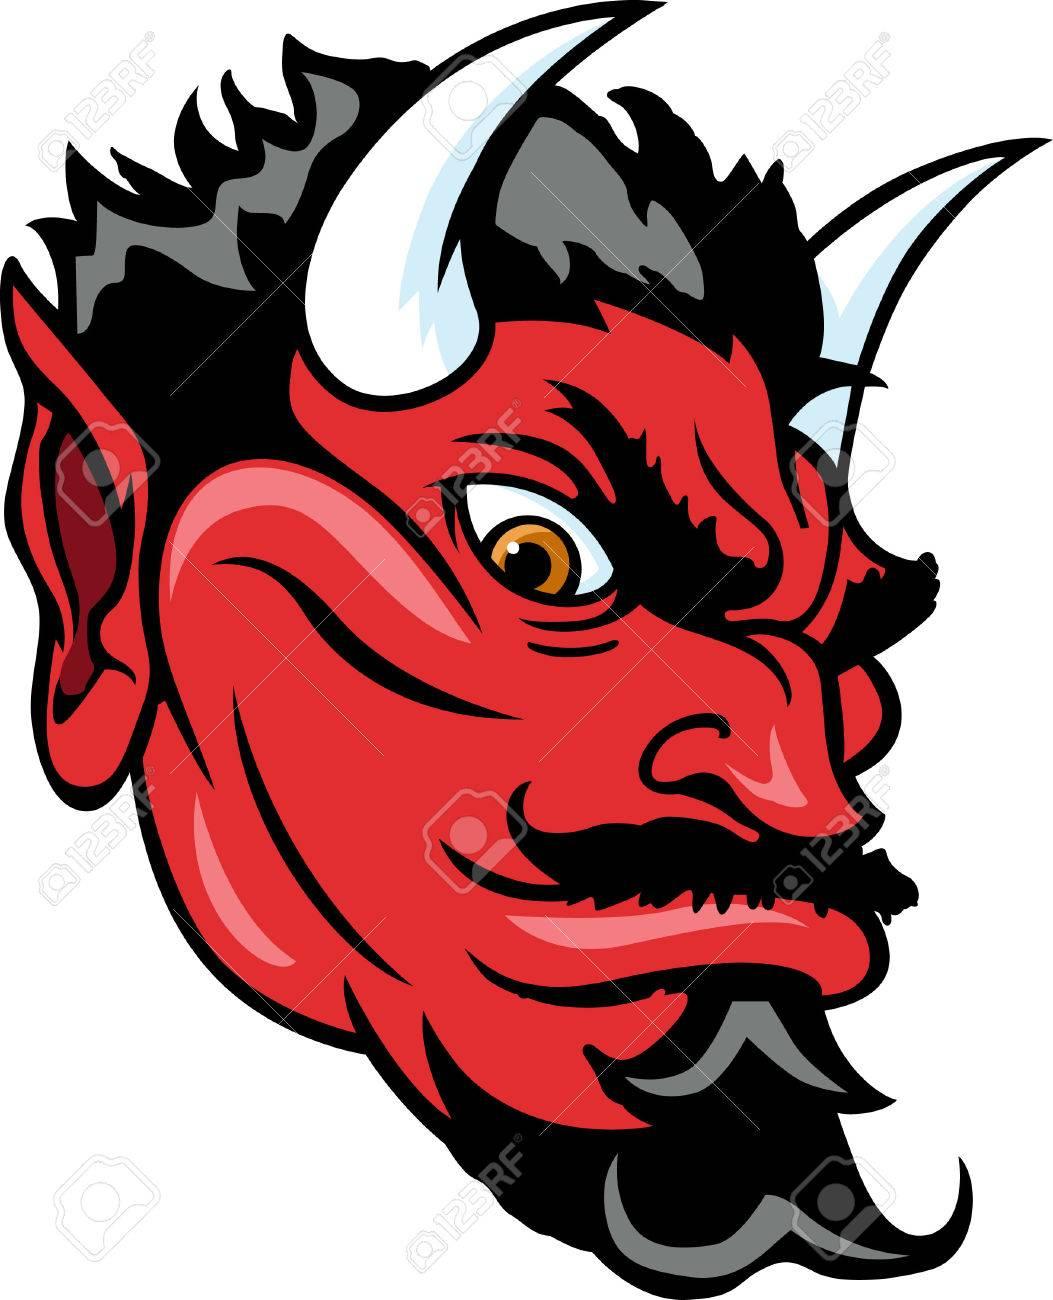 show your team spirit with this devil logo everyone will love rh 123rf com devil's logic devil logo clip art